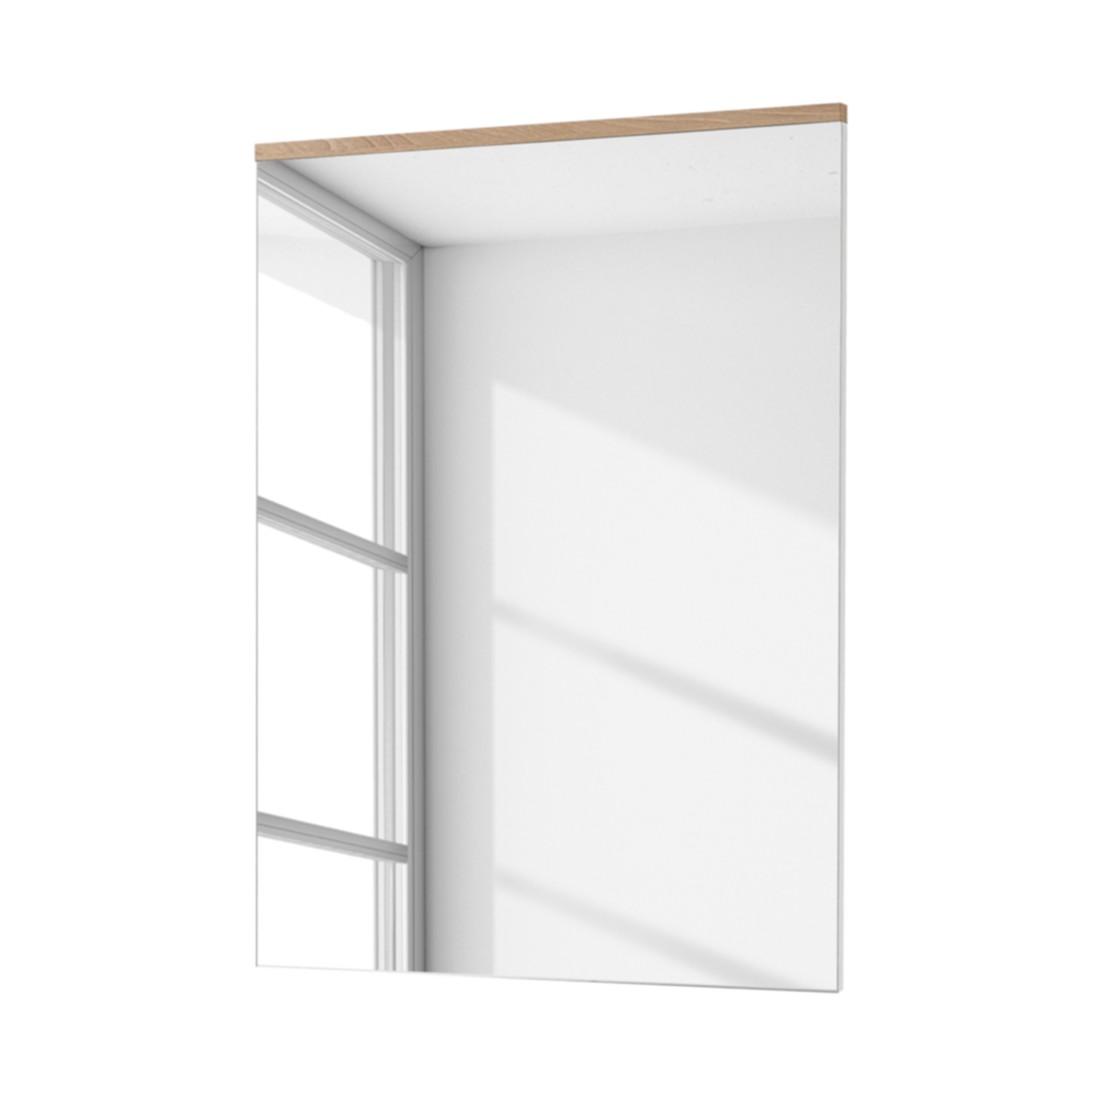 Spiegel Exterior - Hoogglans wit/beukenhouten look, Fredriks